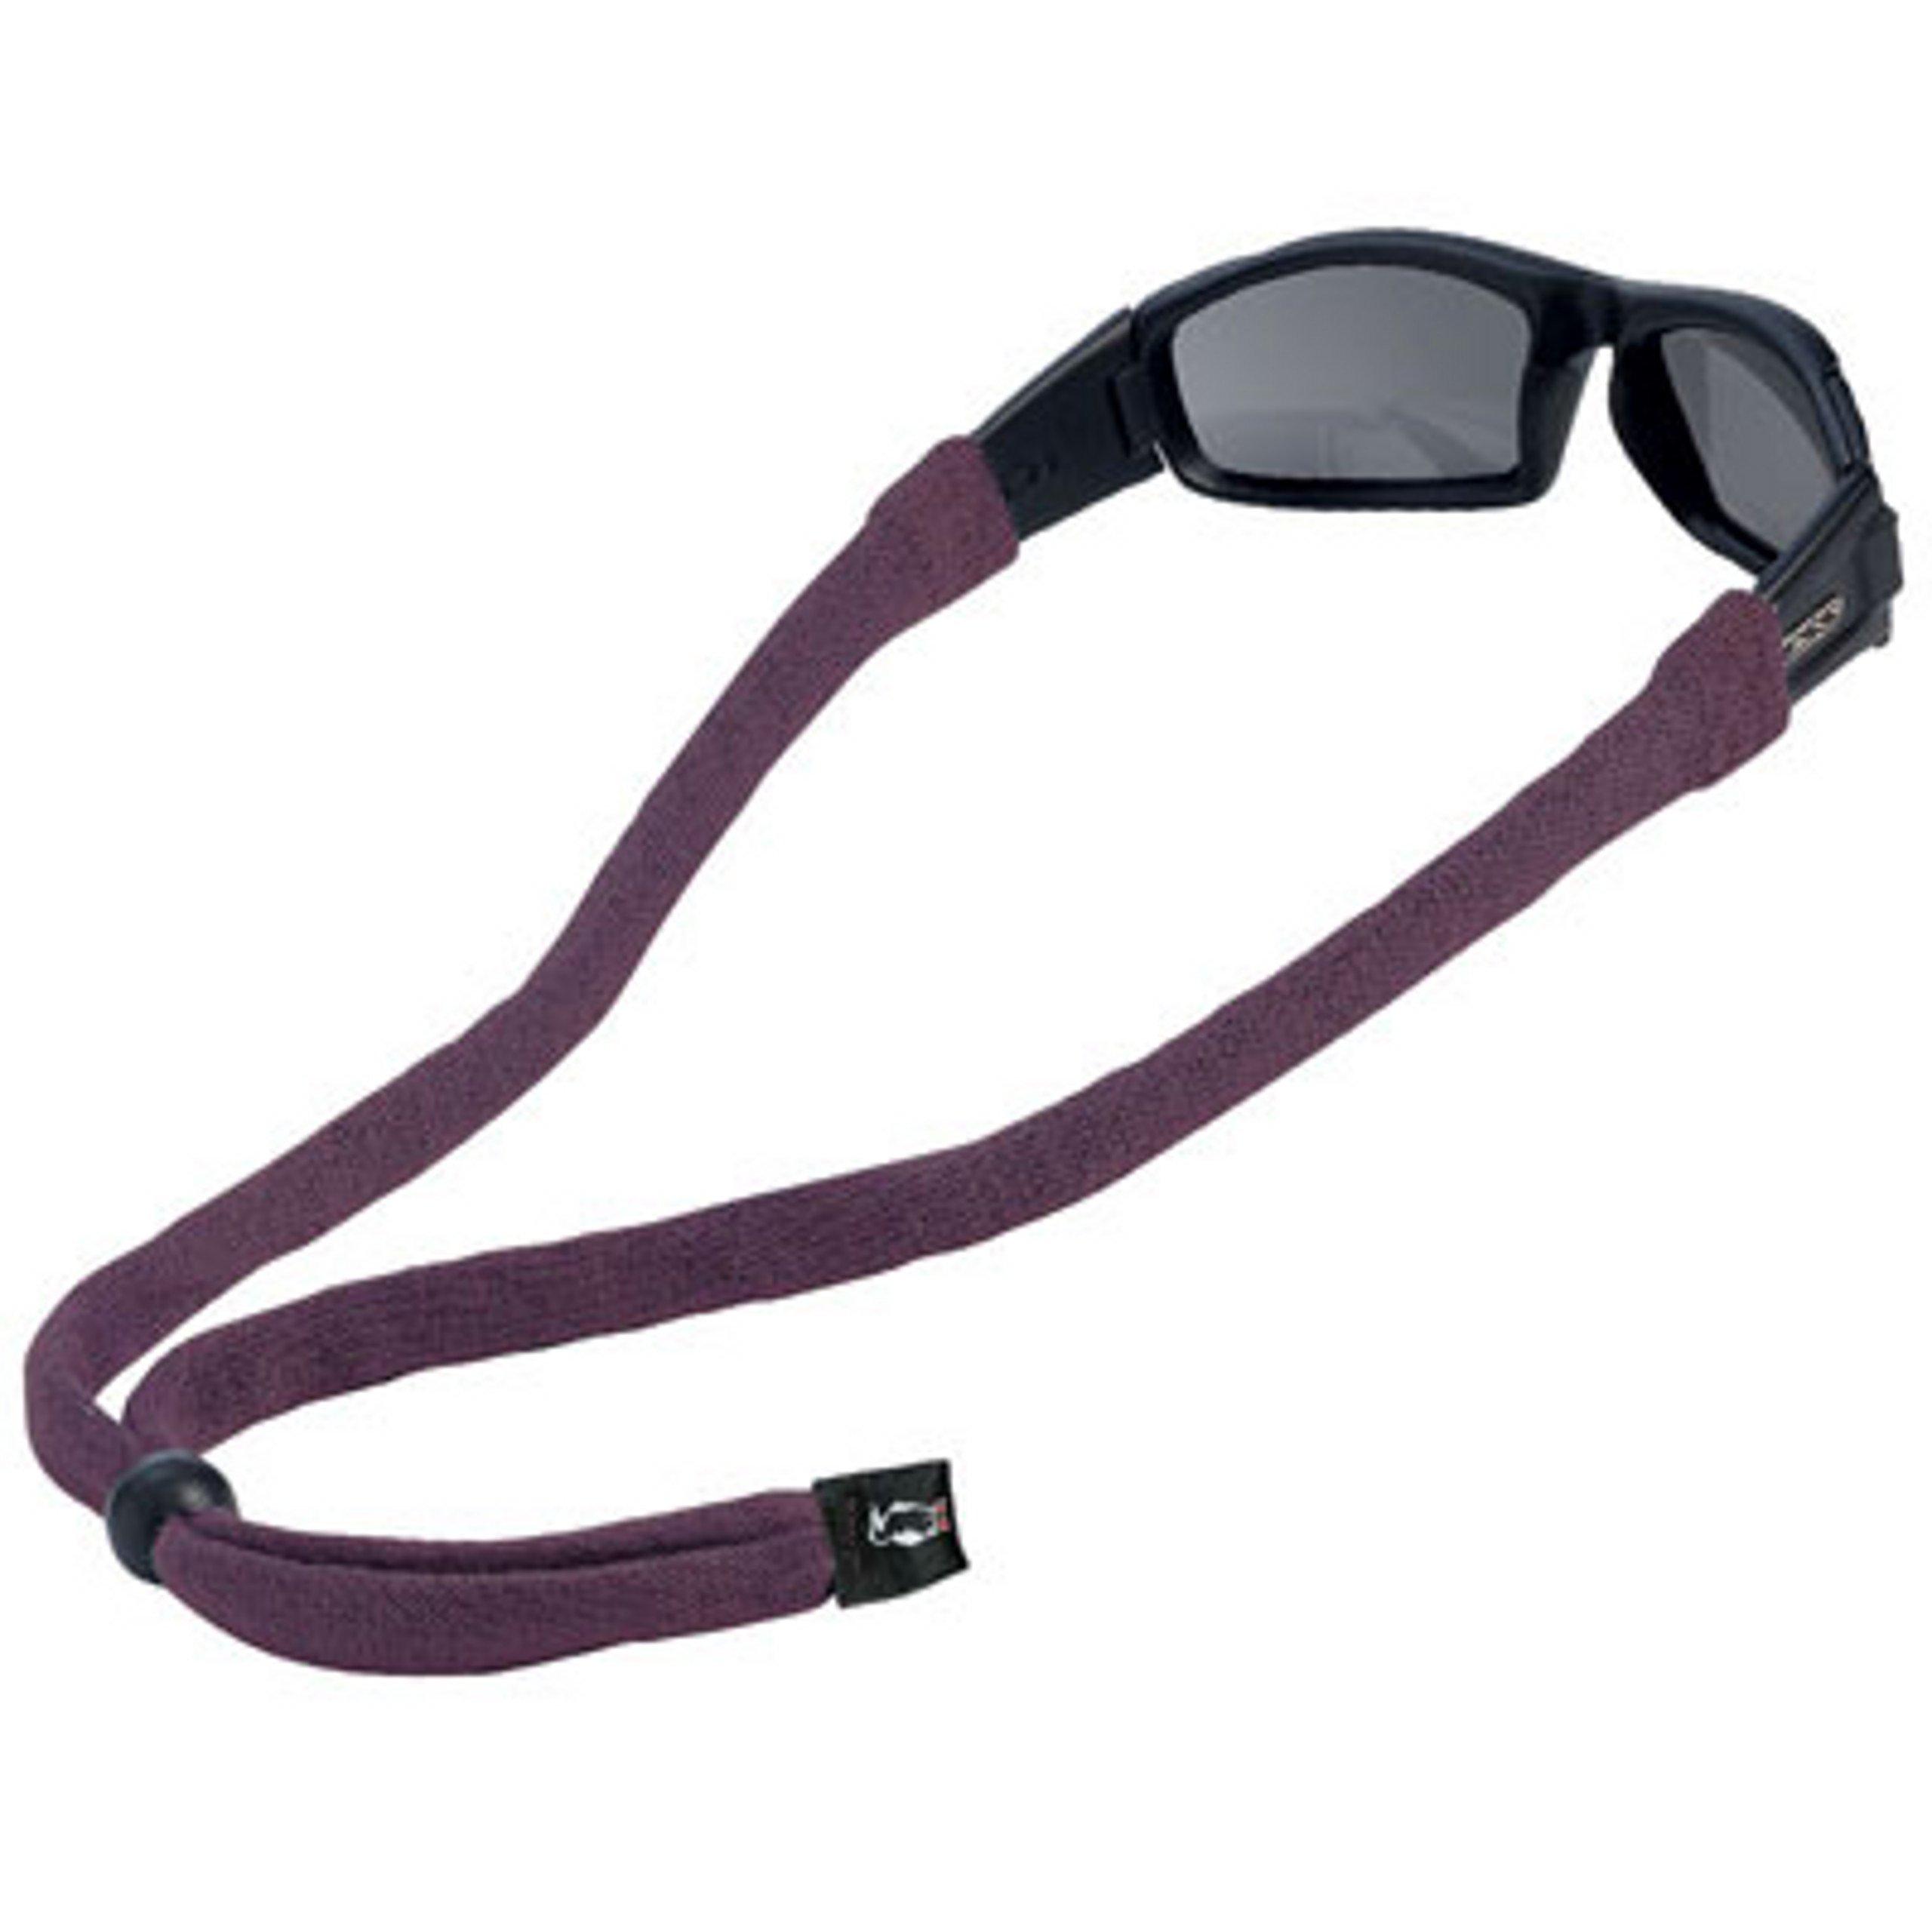 Chums Original Cotton Large End Eyewear Retainer, Dark Purple by Chums